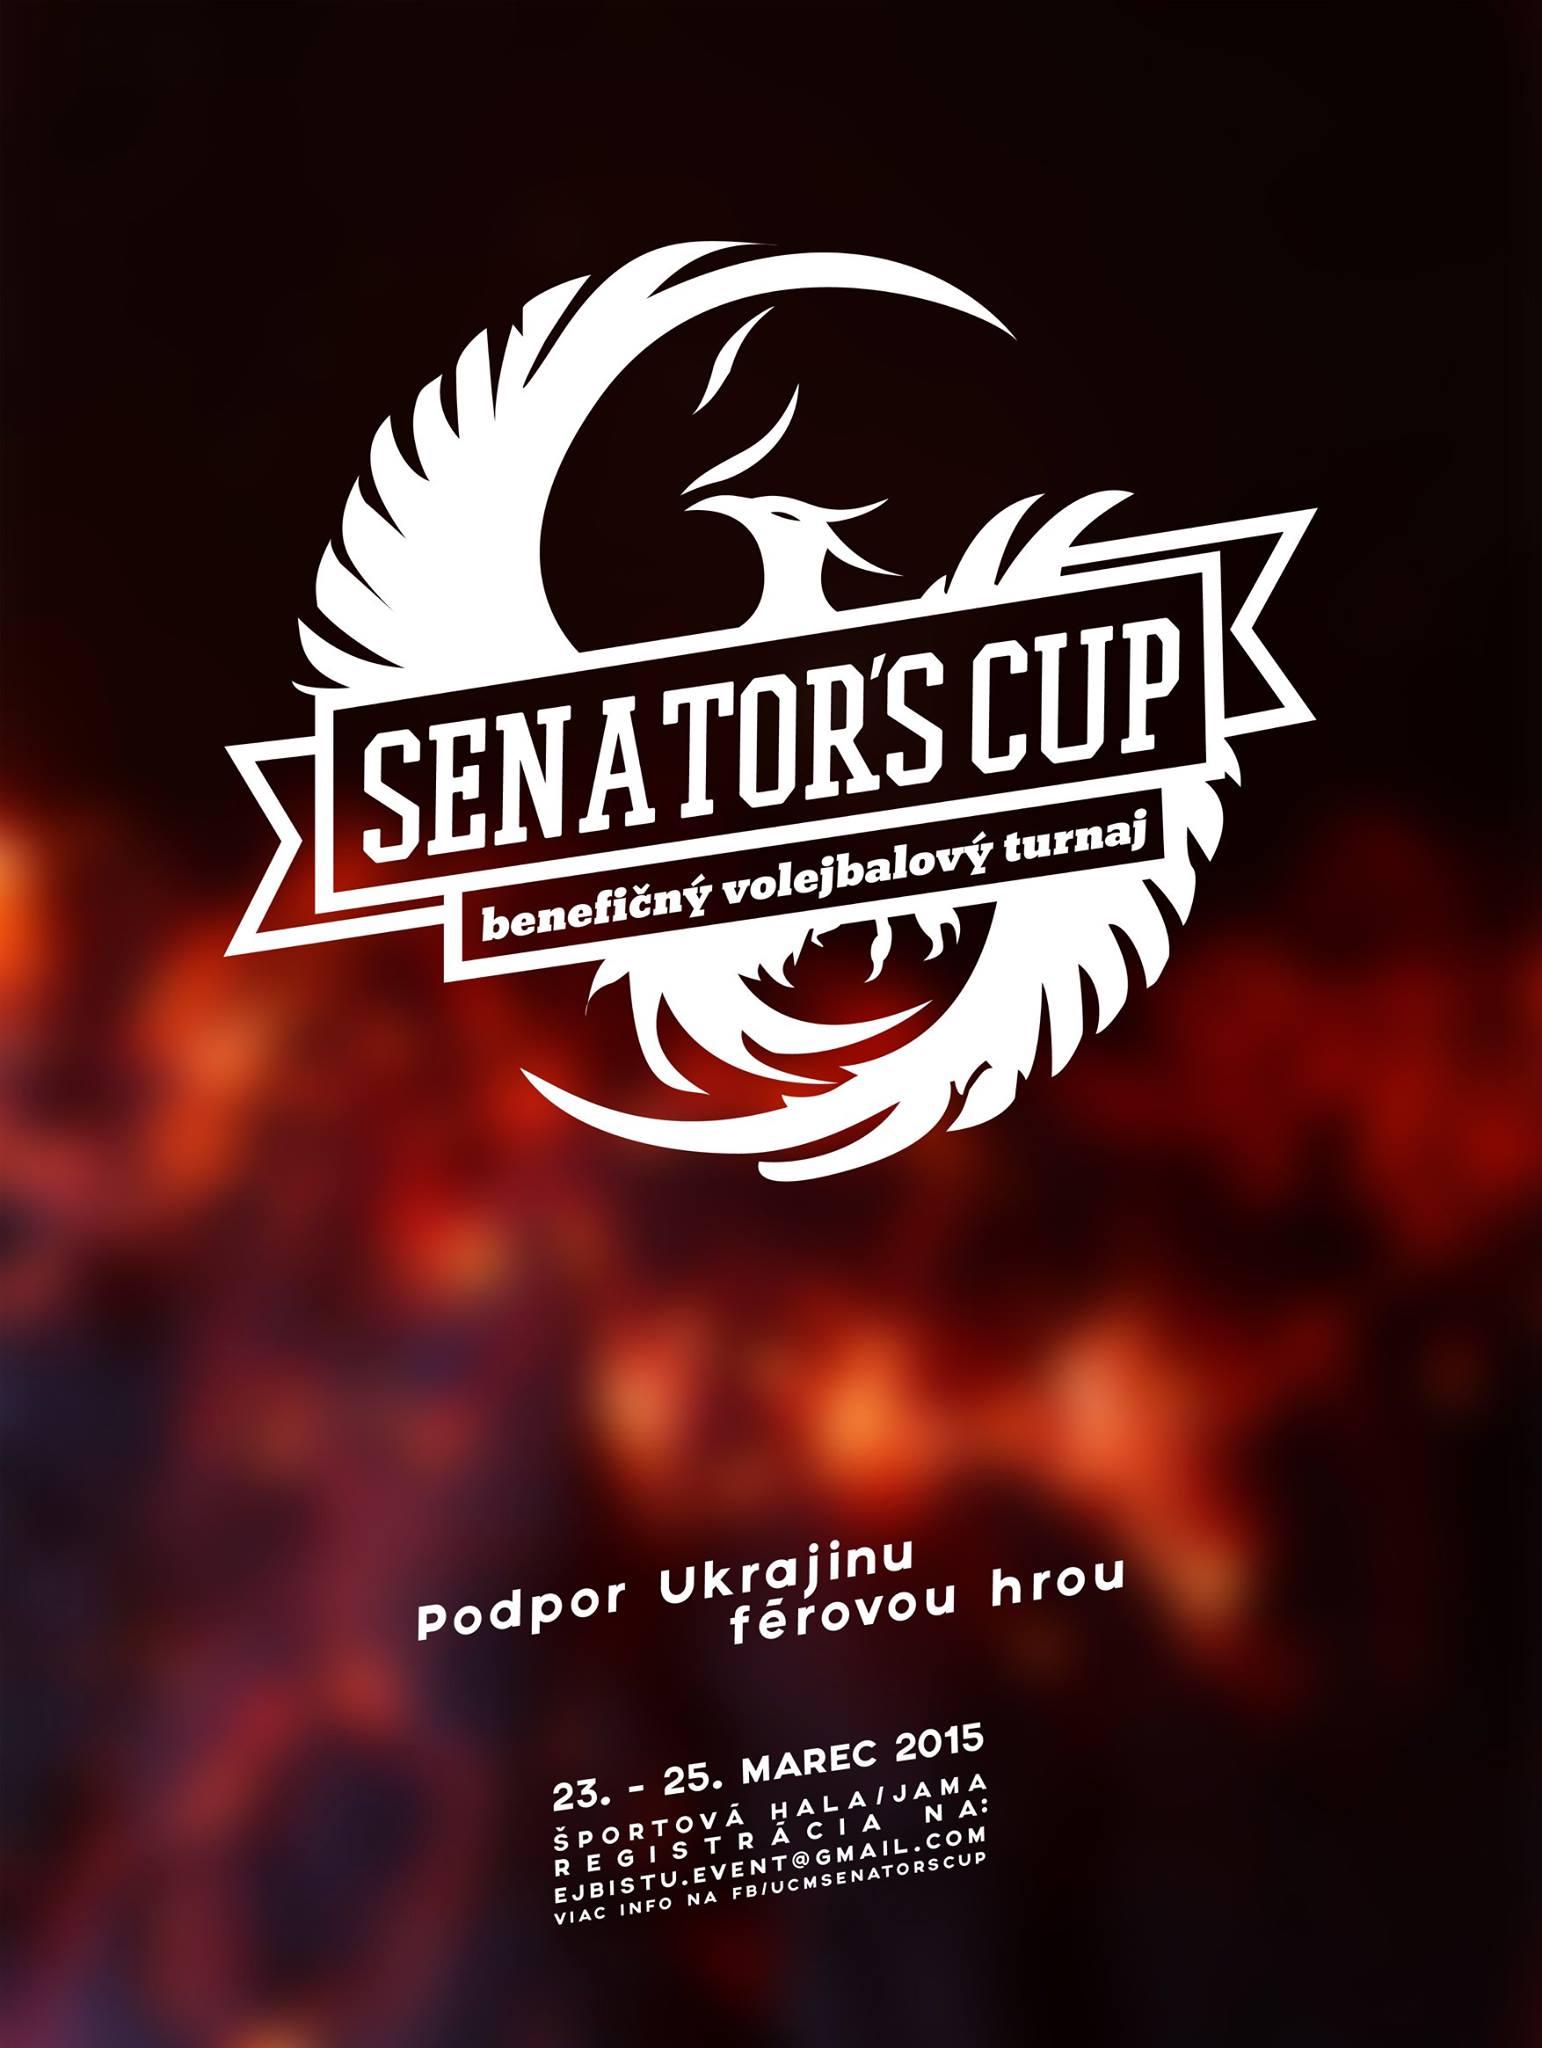 7. ročník Senator's Cup